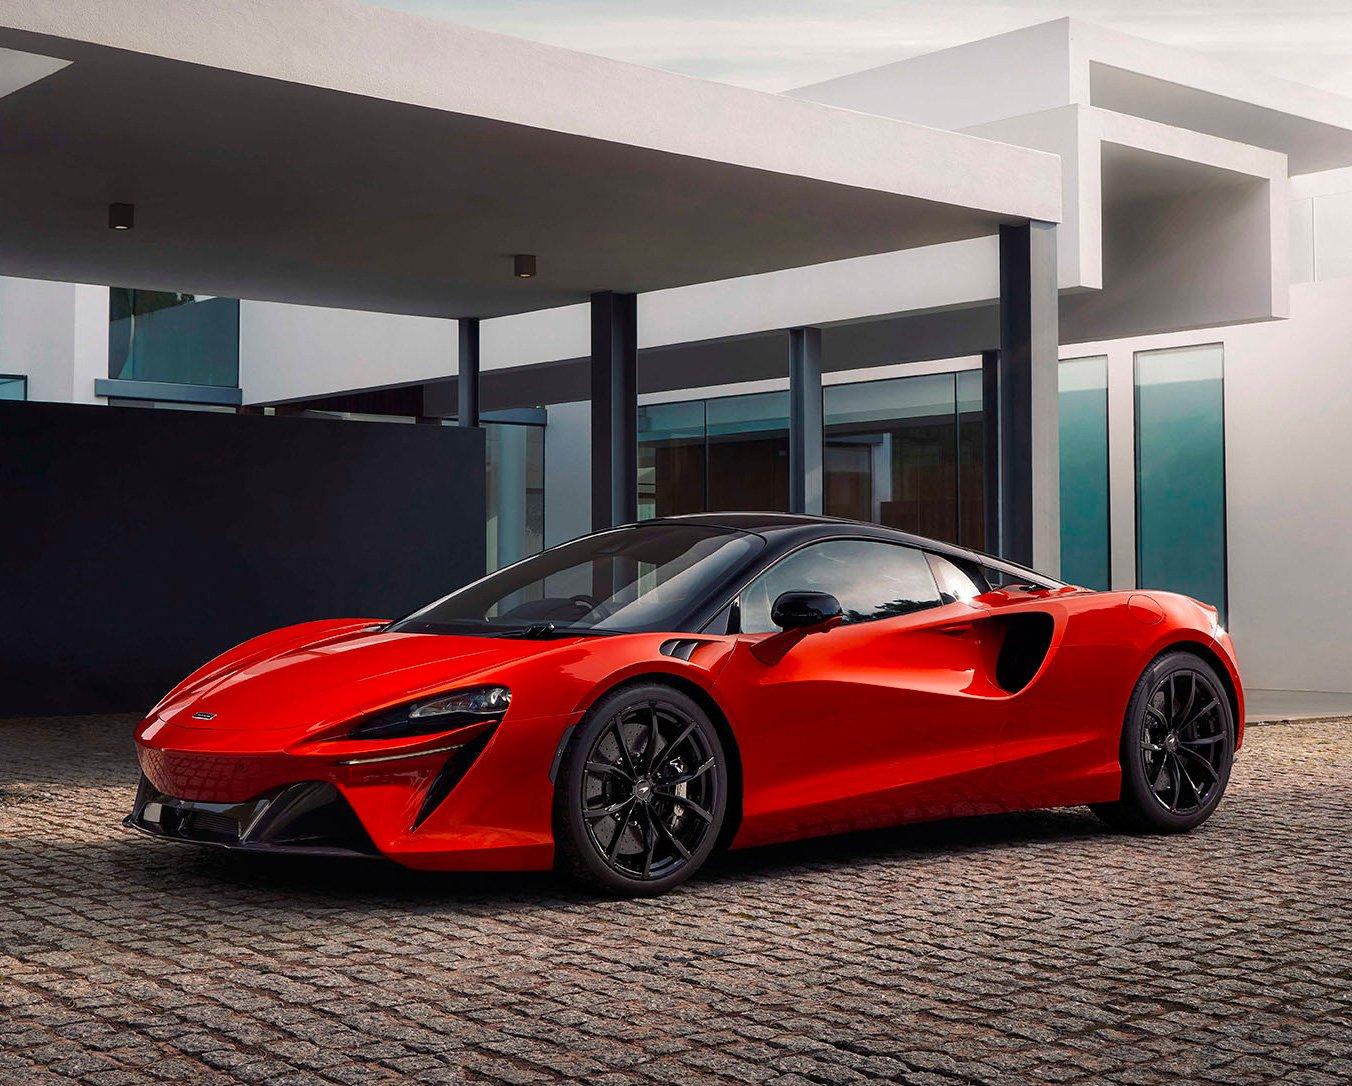 McLaren Powers Up 671-Horse Altura Plug-In Hybrid at werd.com